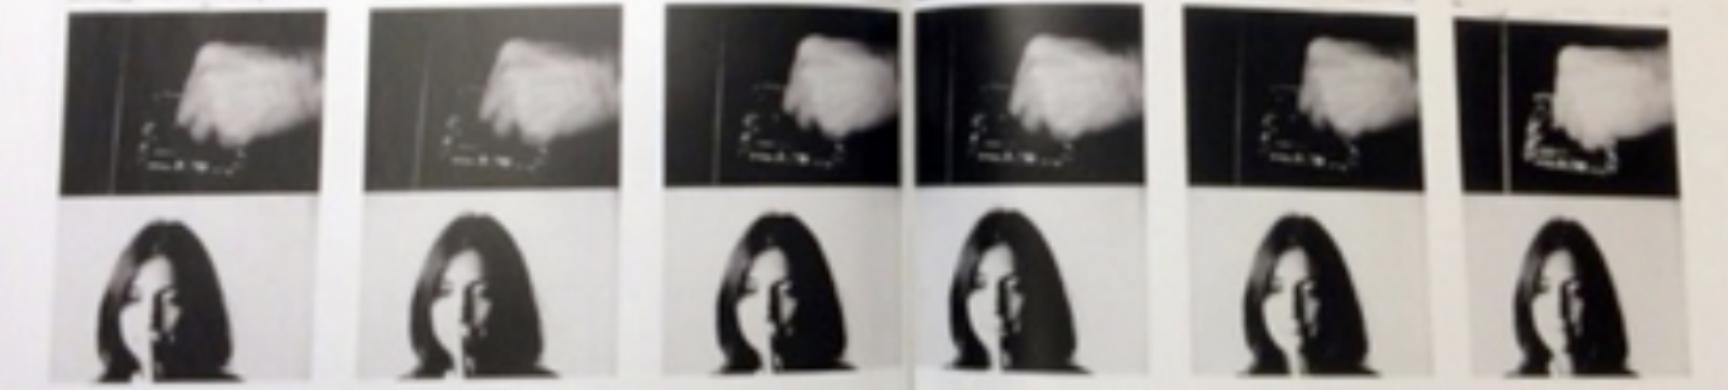 John Baldessari, Action Reaction Series (Synchronized)- Putting Out Cigarette, 1976